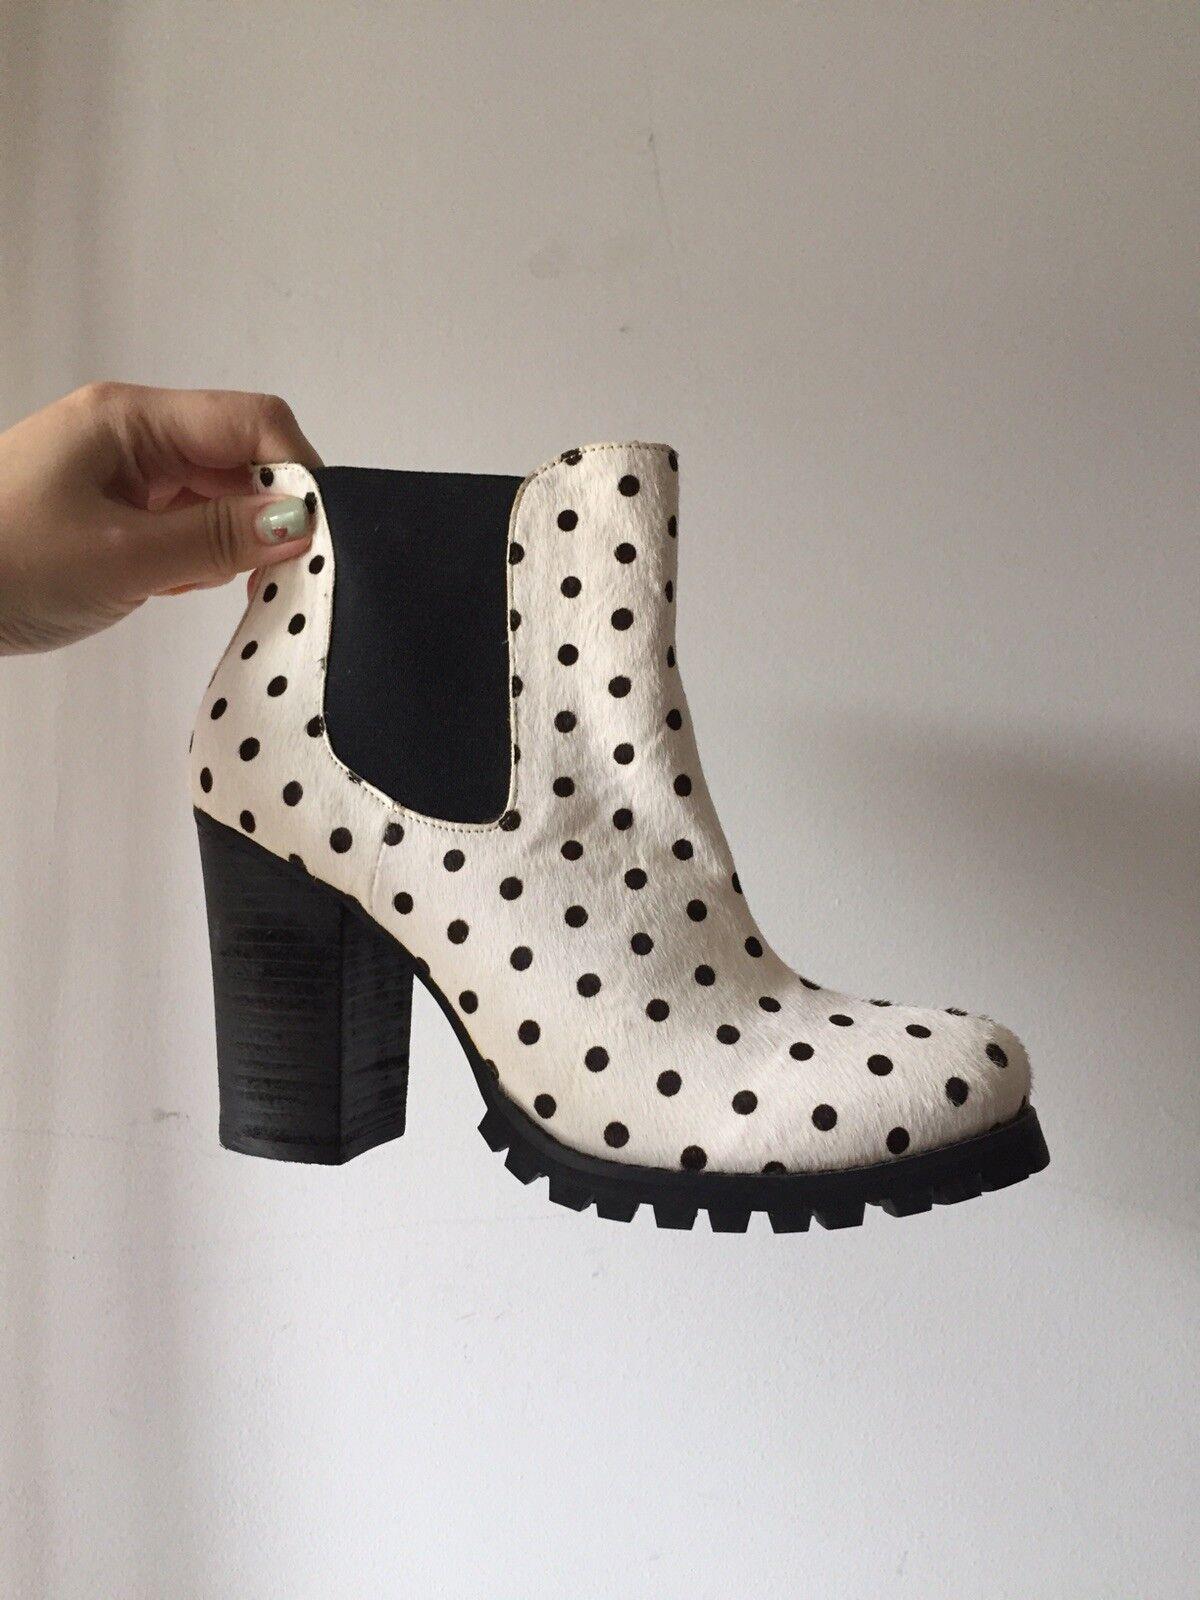 Nastygal Shoe Cult Black & White Pony Hair Chelsea Heeled Boots Size U.S 8.5 New